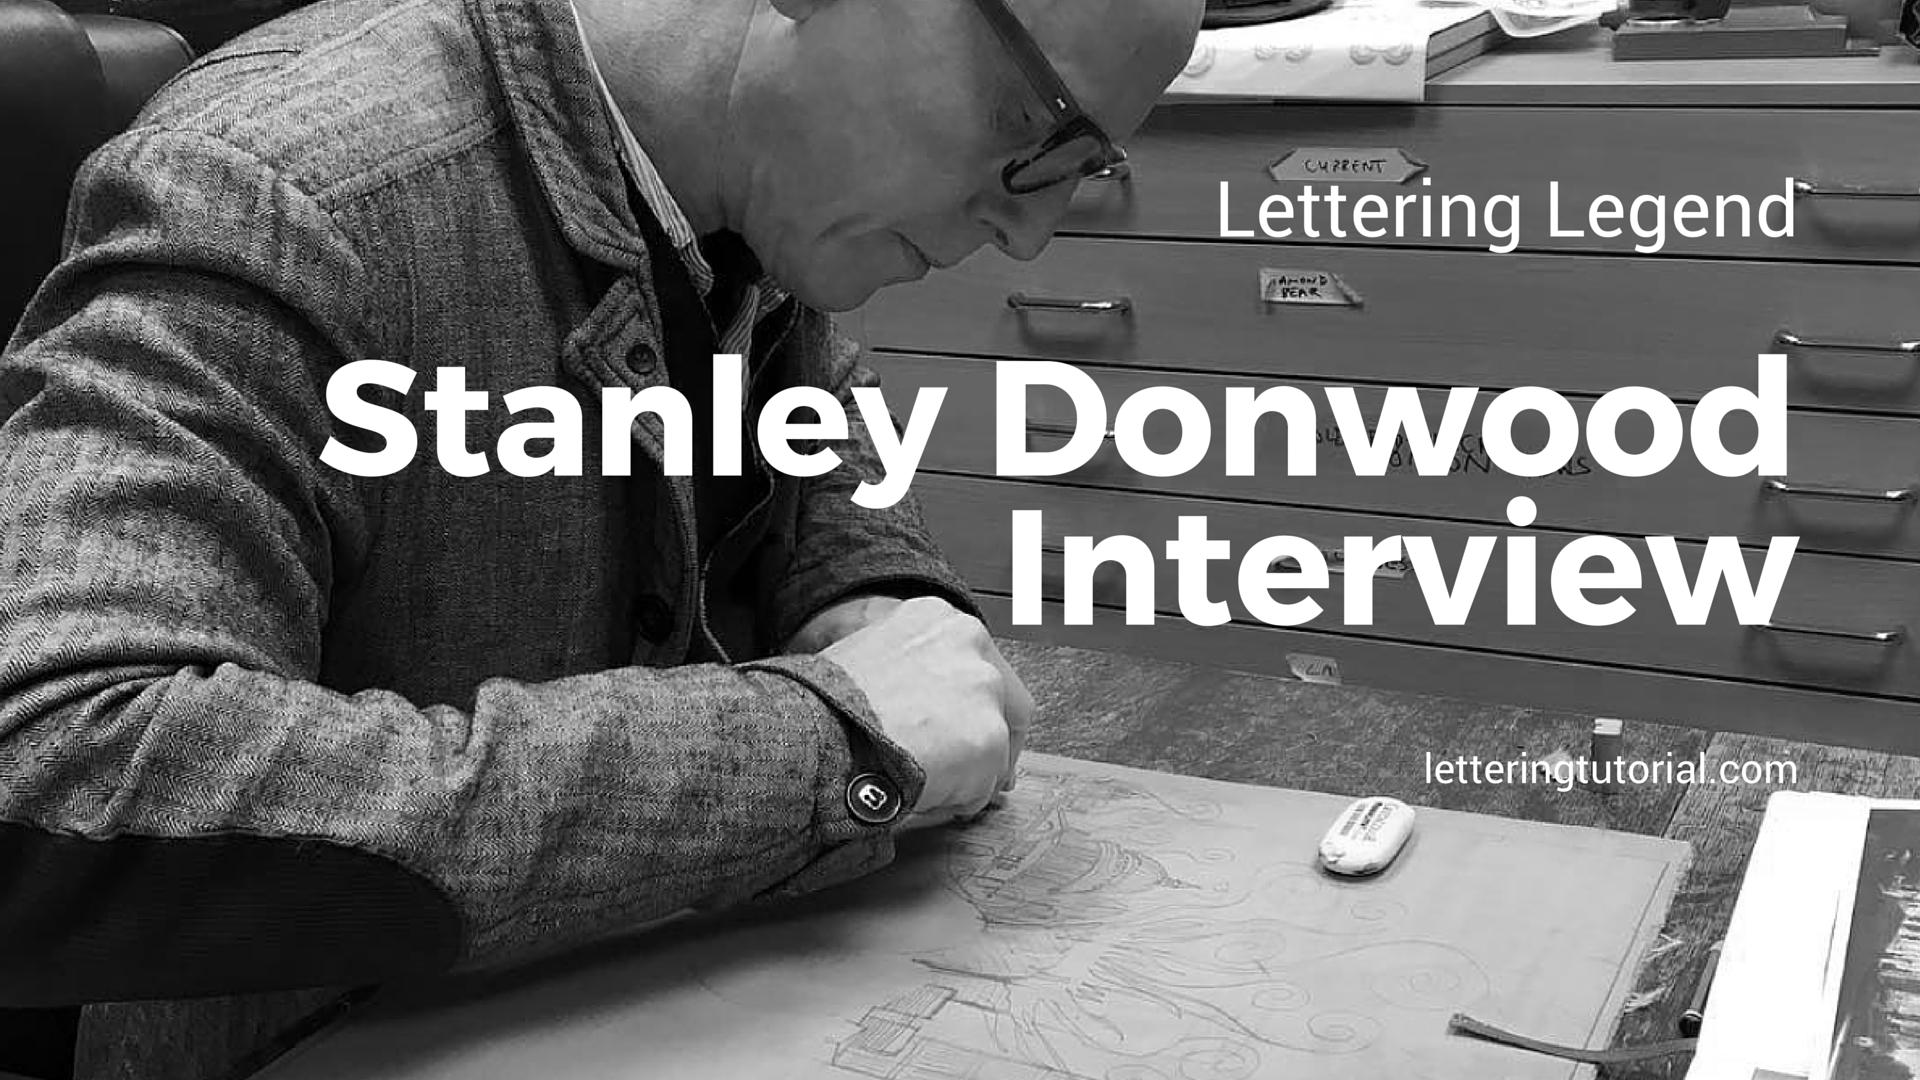 Lettering Legend Stanley Donwood Interview - Lettering Tutorial